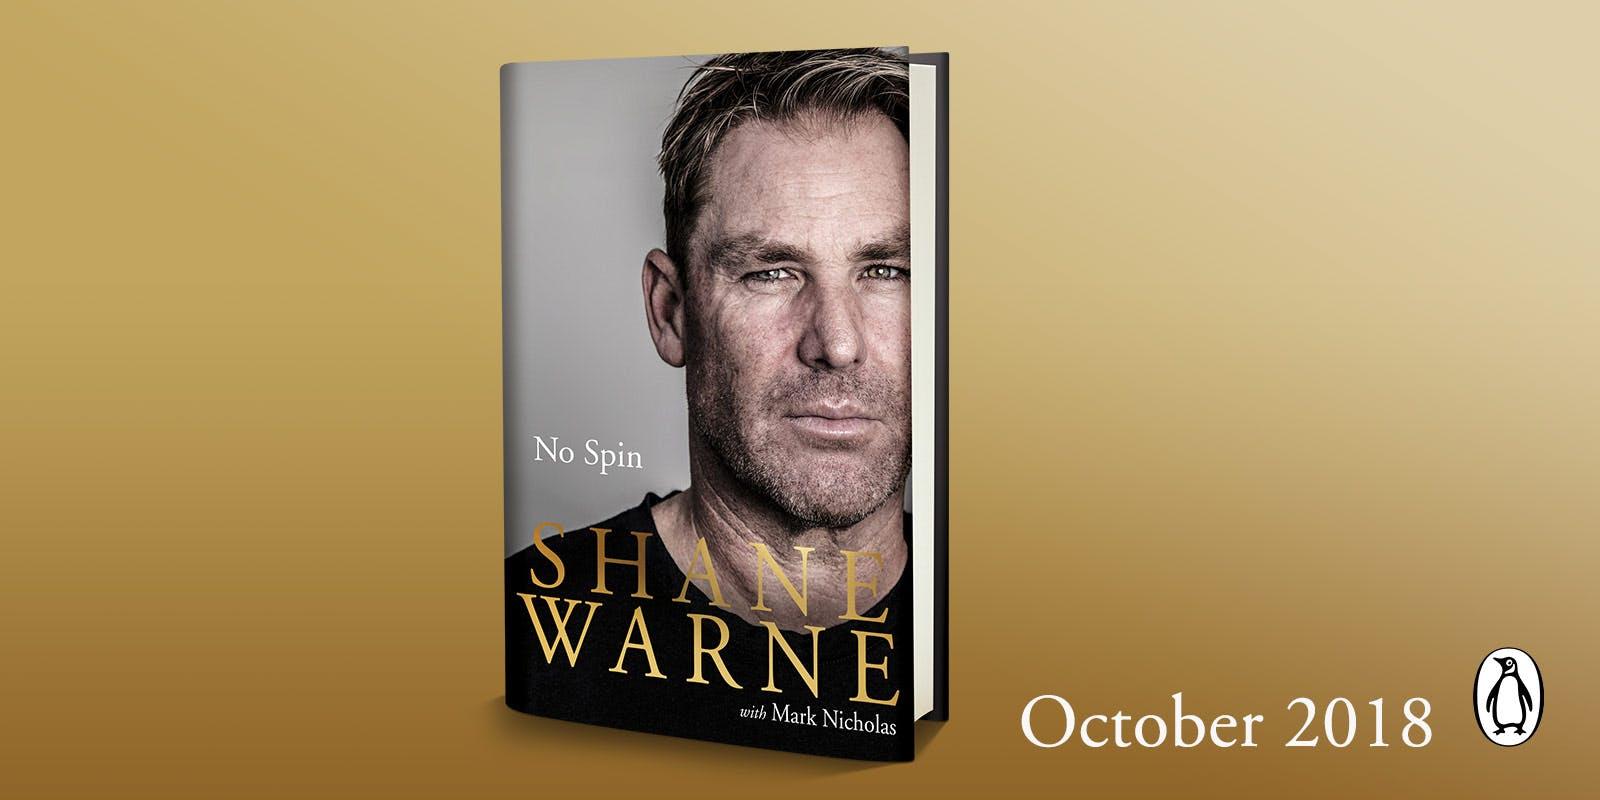 Announcing Shane Warne's memoir